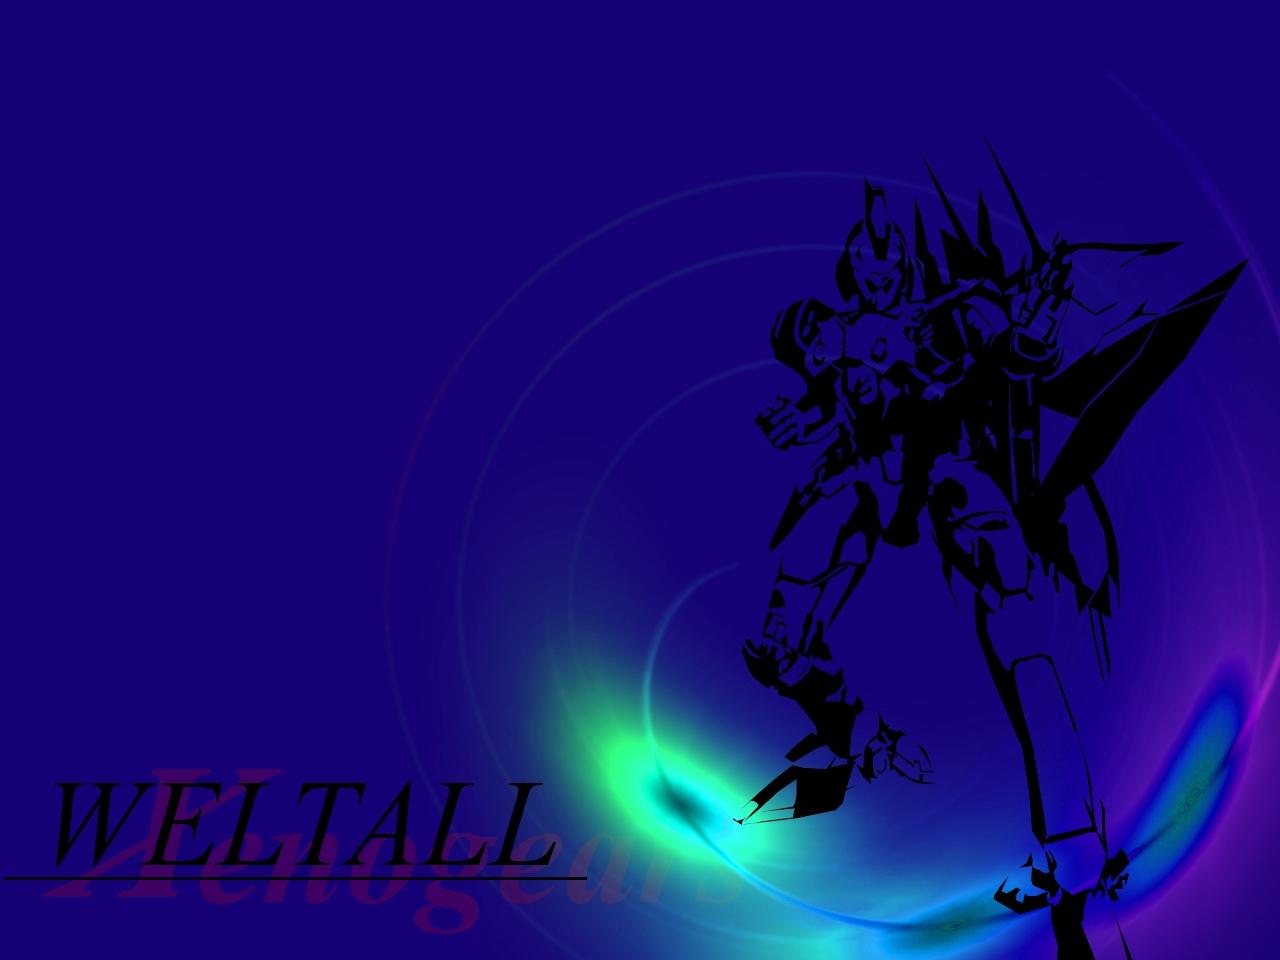 c0223391_001650.jpg